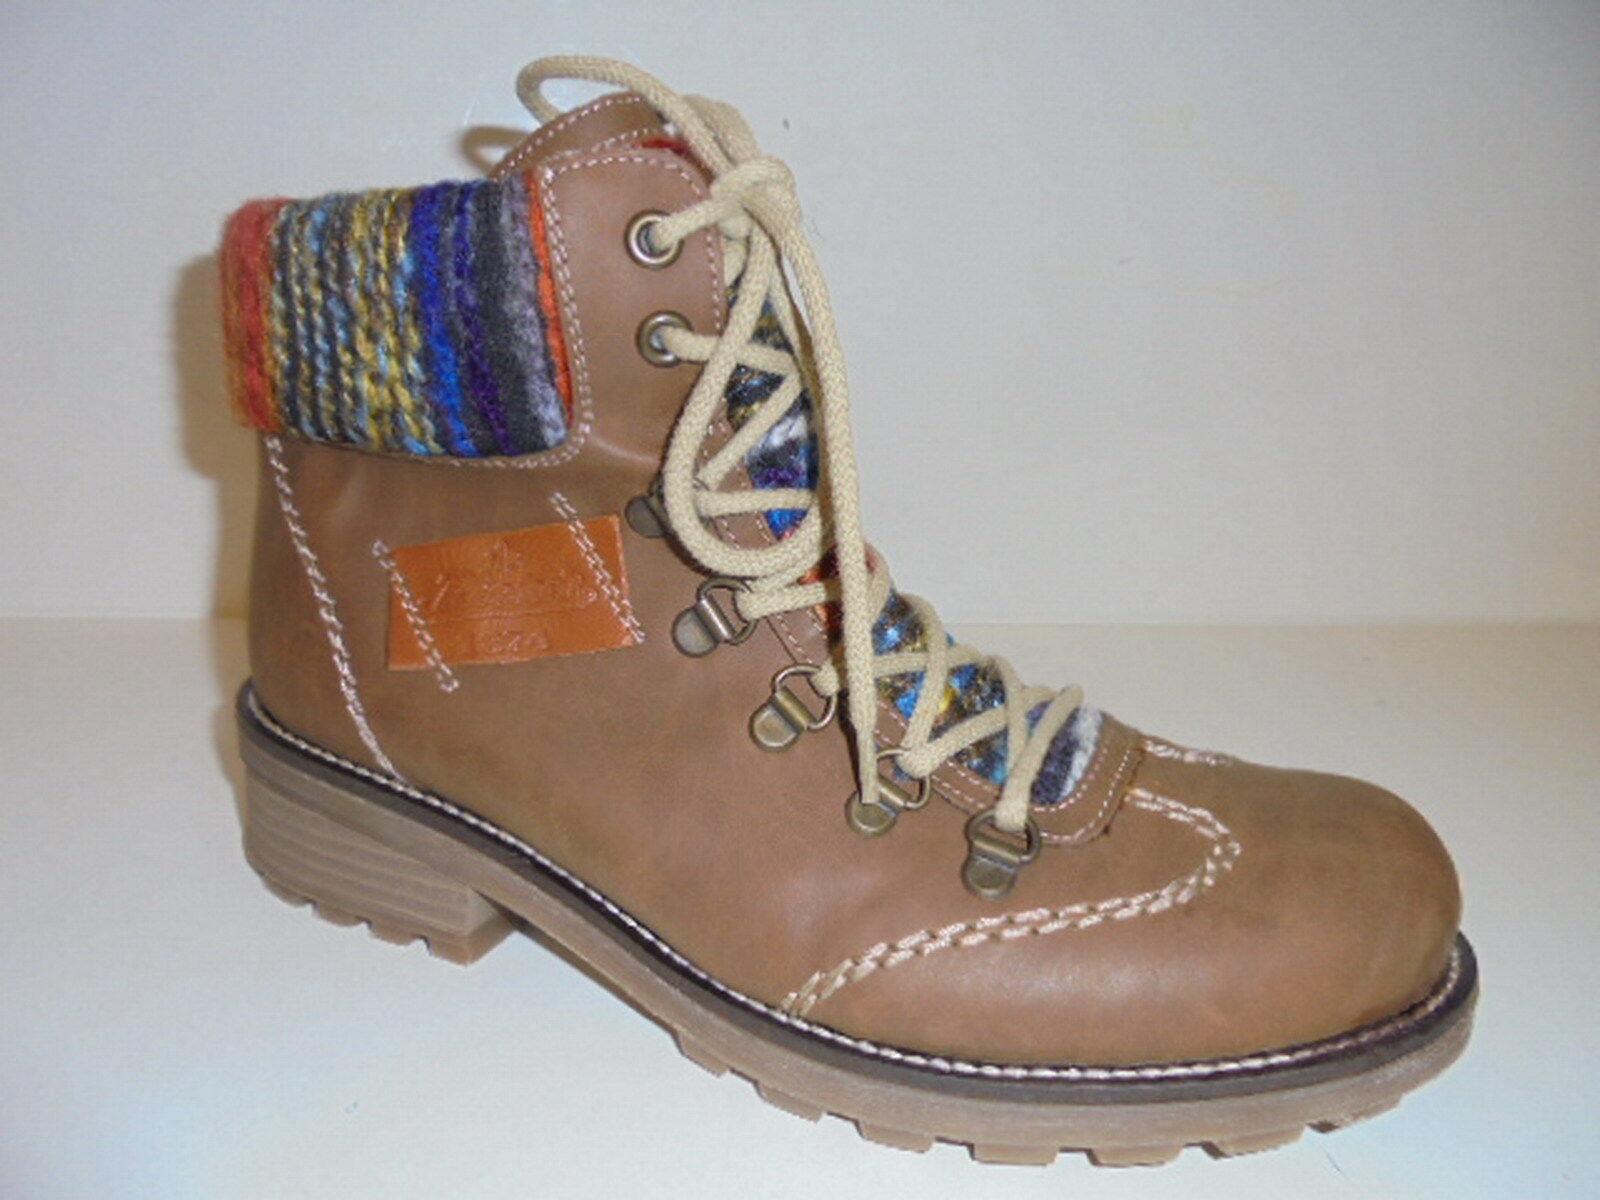 Z0443 Rieker Damenschuhe Stiefelette Boots braun Warmfutter Lammwolle Gr. 41